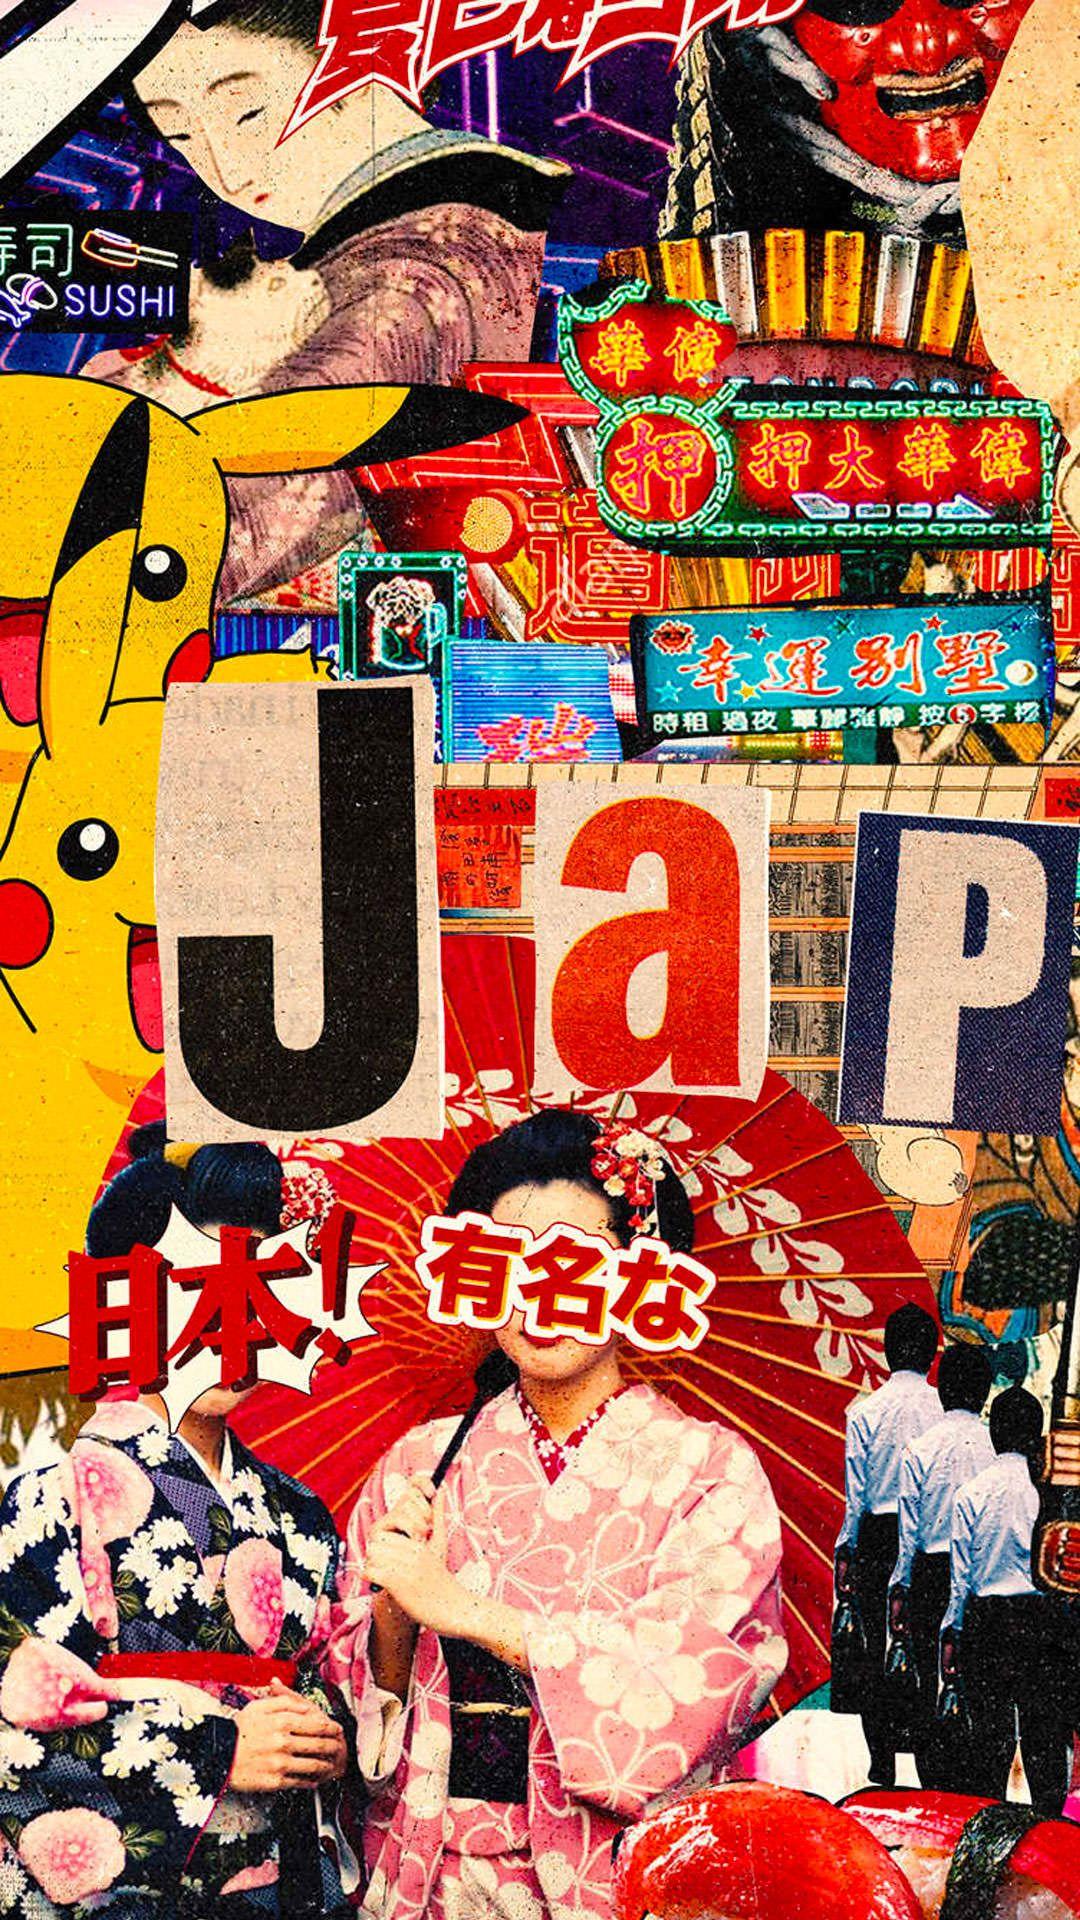 Pin By Gustavo Avila On Japan Art Japanese Wallpaper Iphone Photoshop Wallpapers Iphone Wallpaper Japan